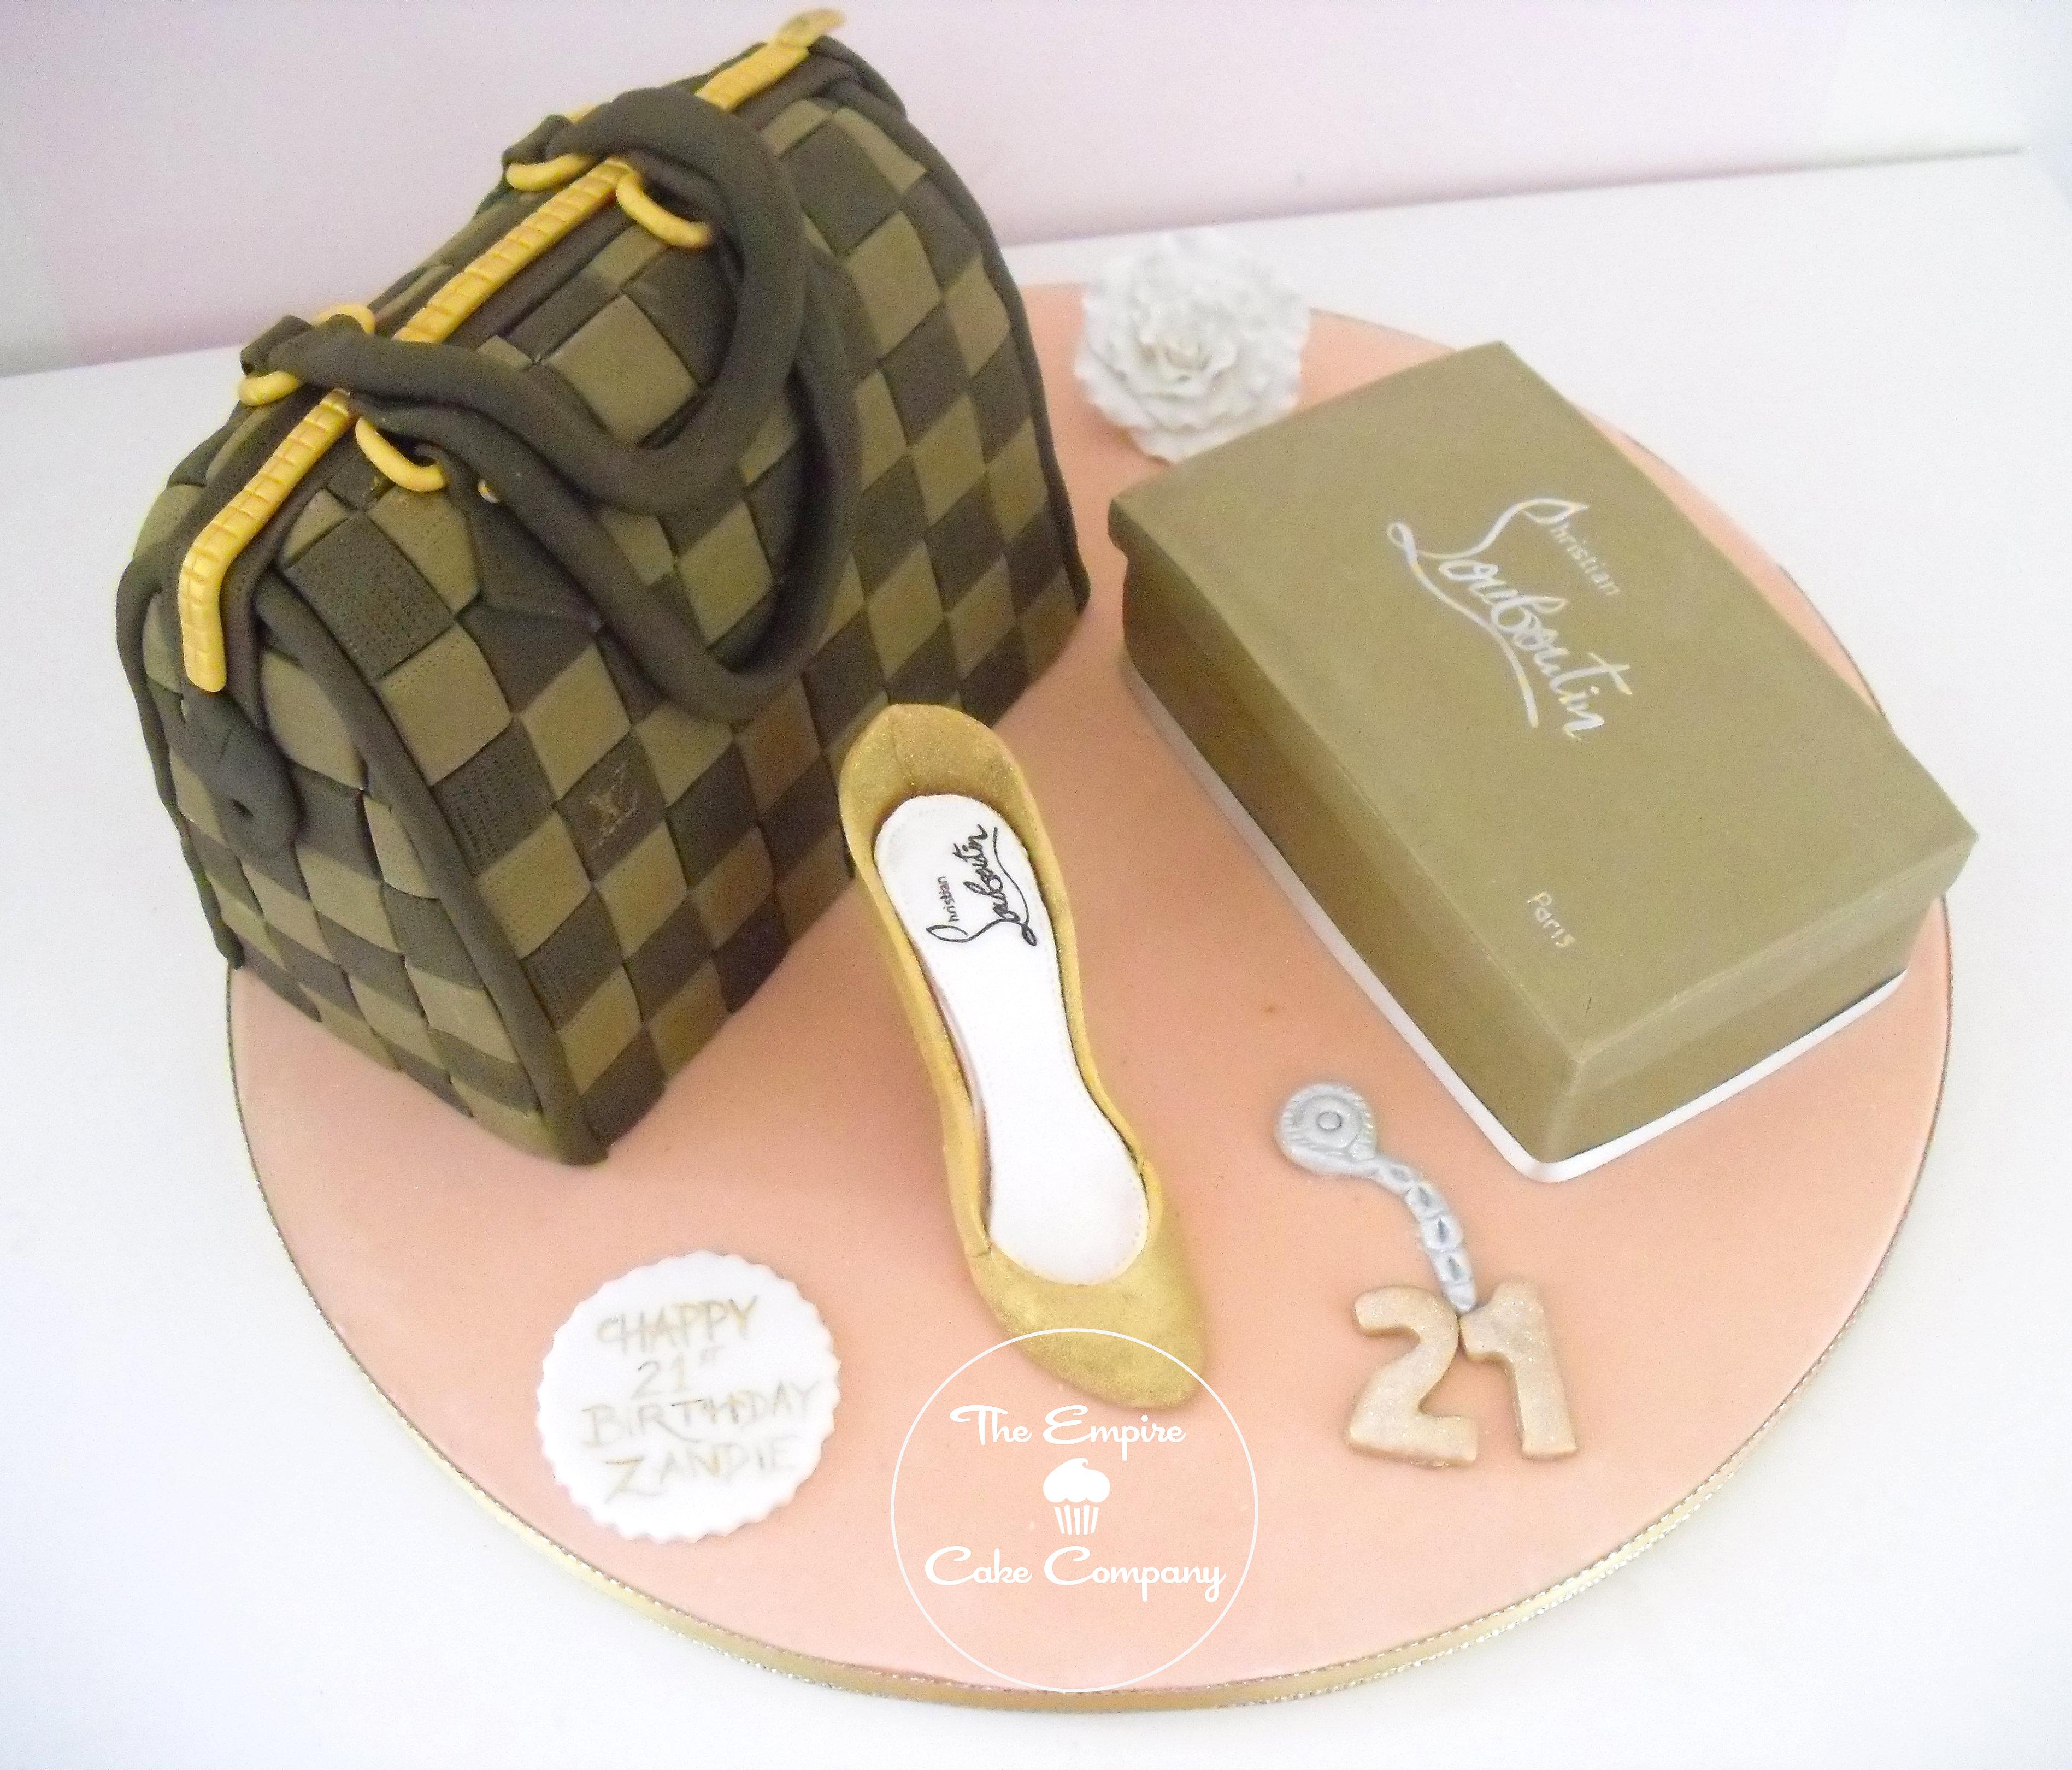 Empirecakecompany Louis Vuitton Louboutin Cake